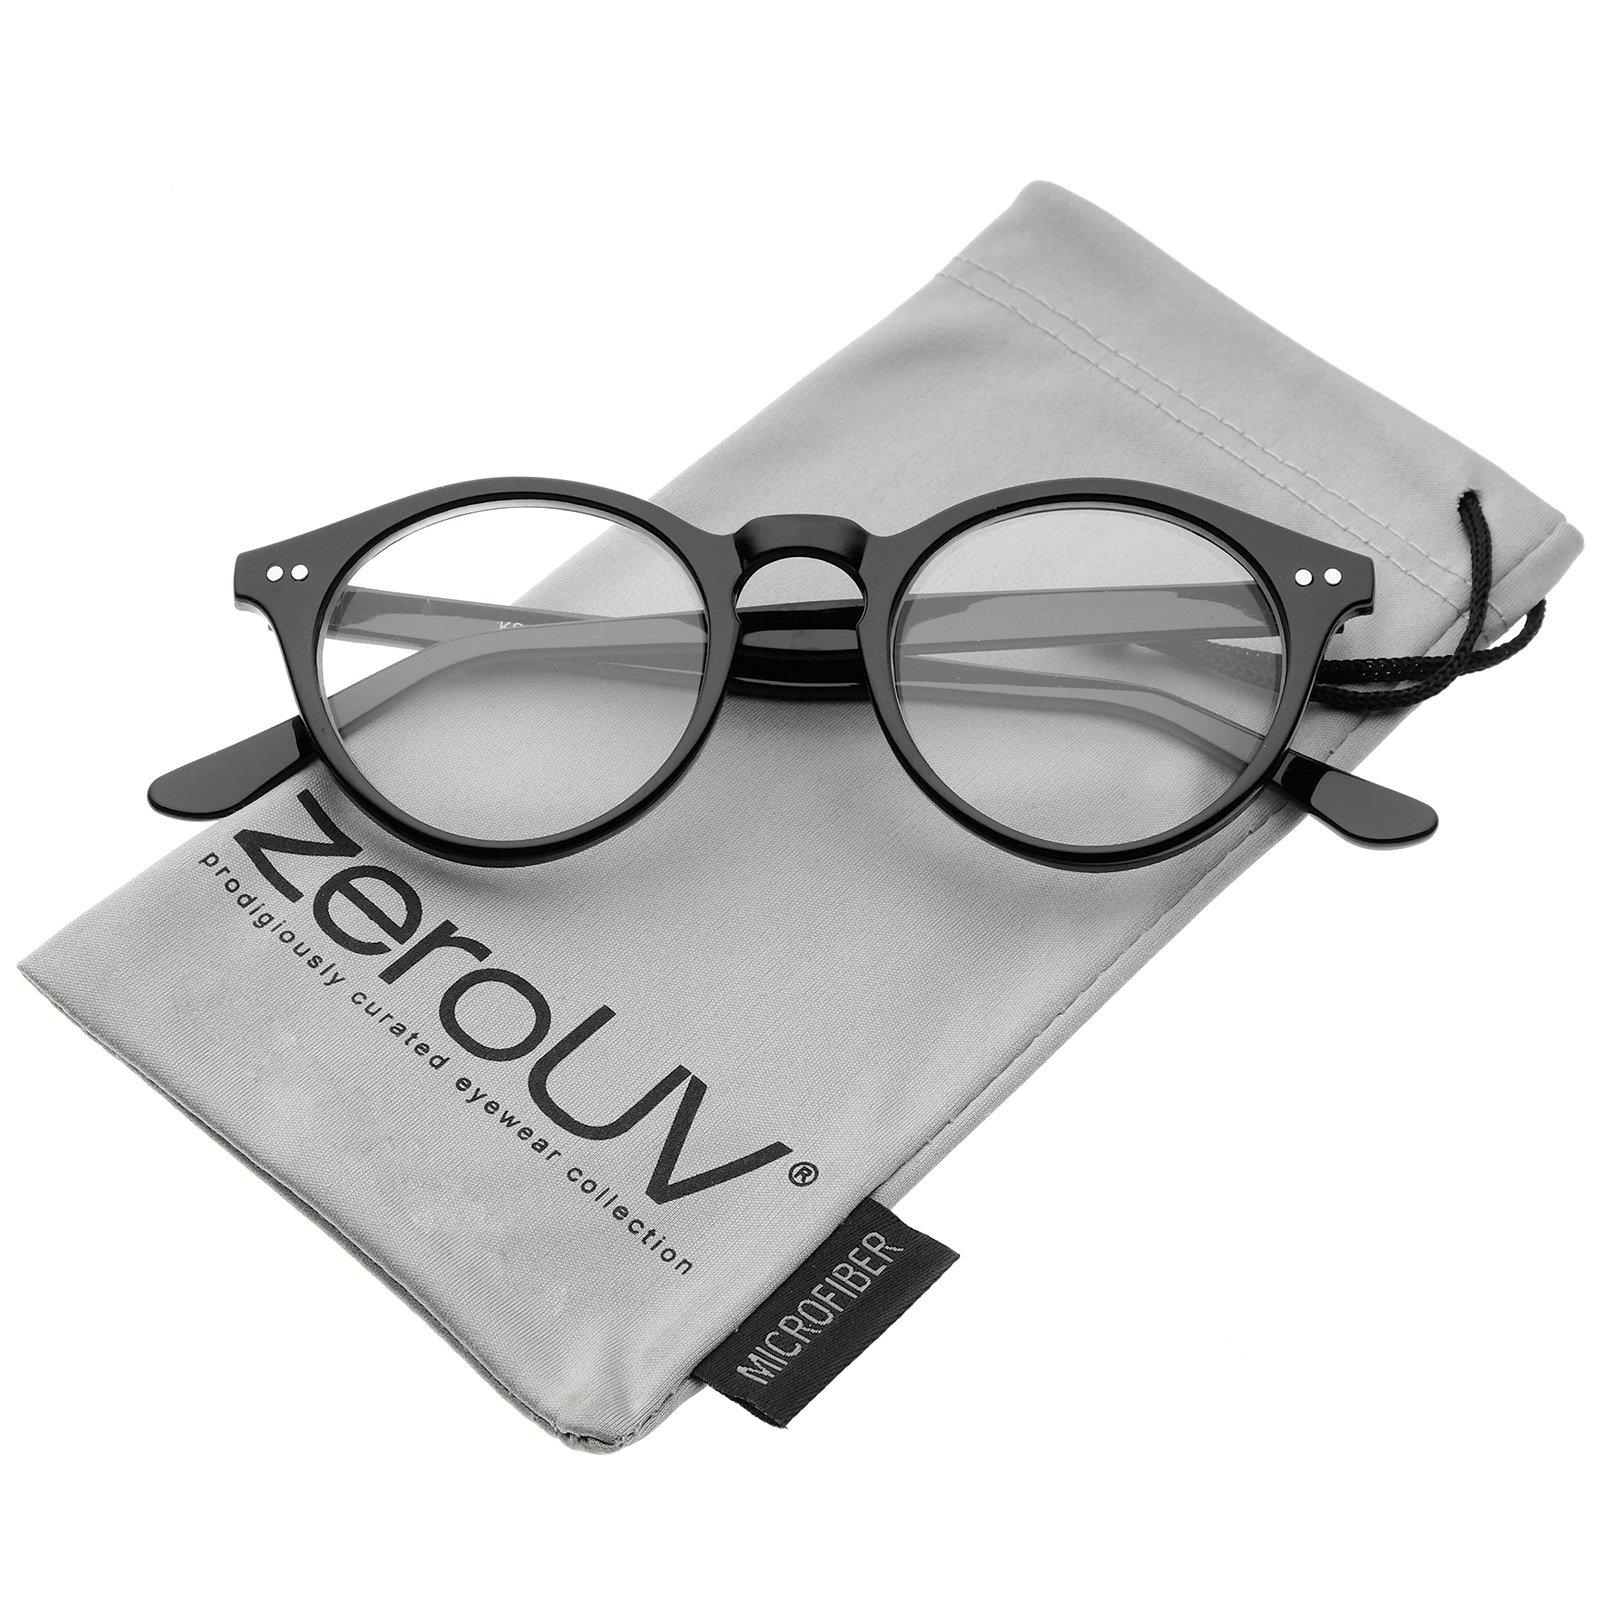 Retro Keyhole Nose Bridge Clear Lens P3 Round Glasses 46mm (Black/Clear)